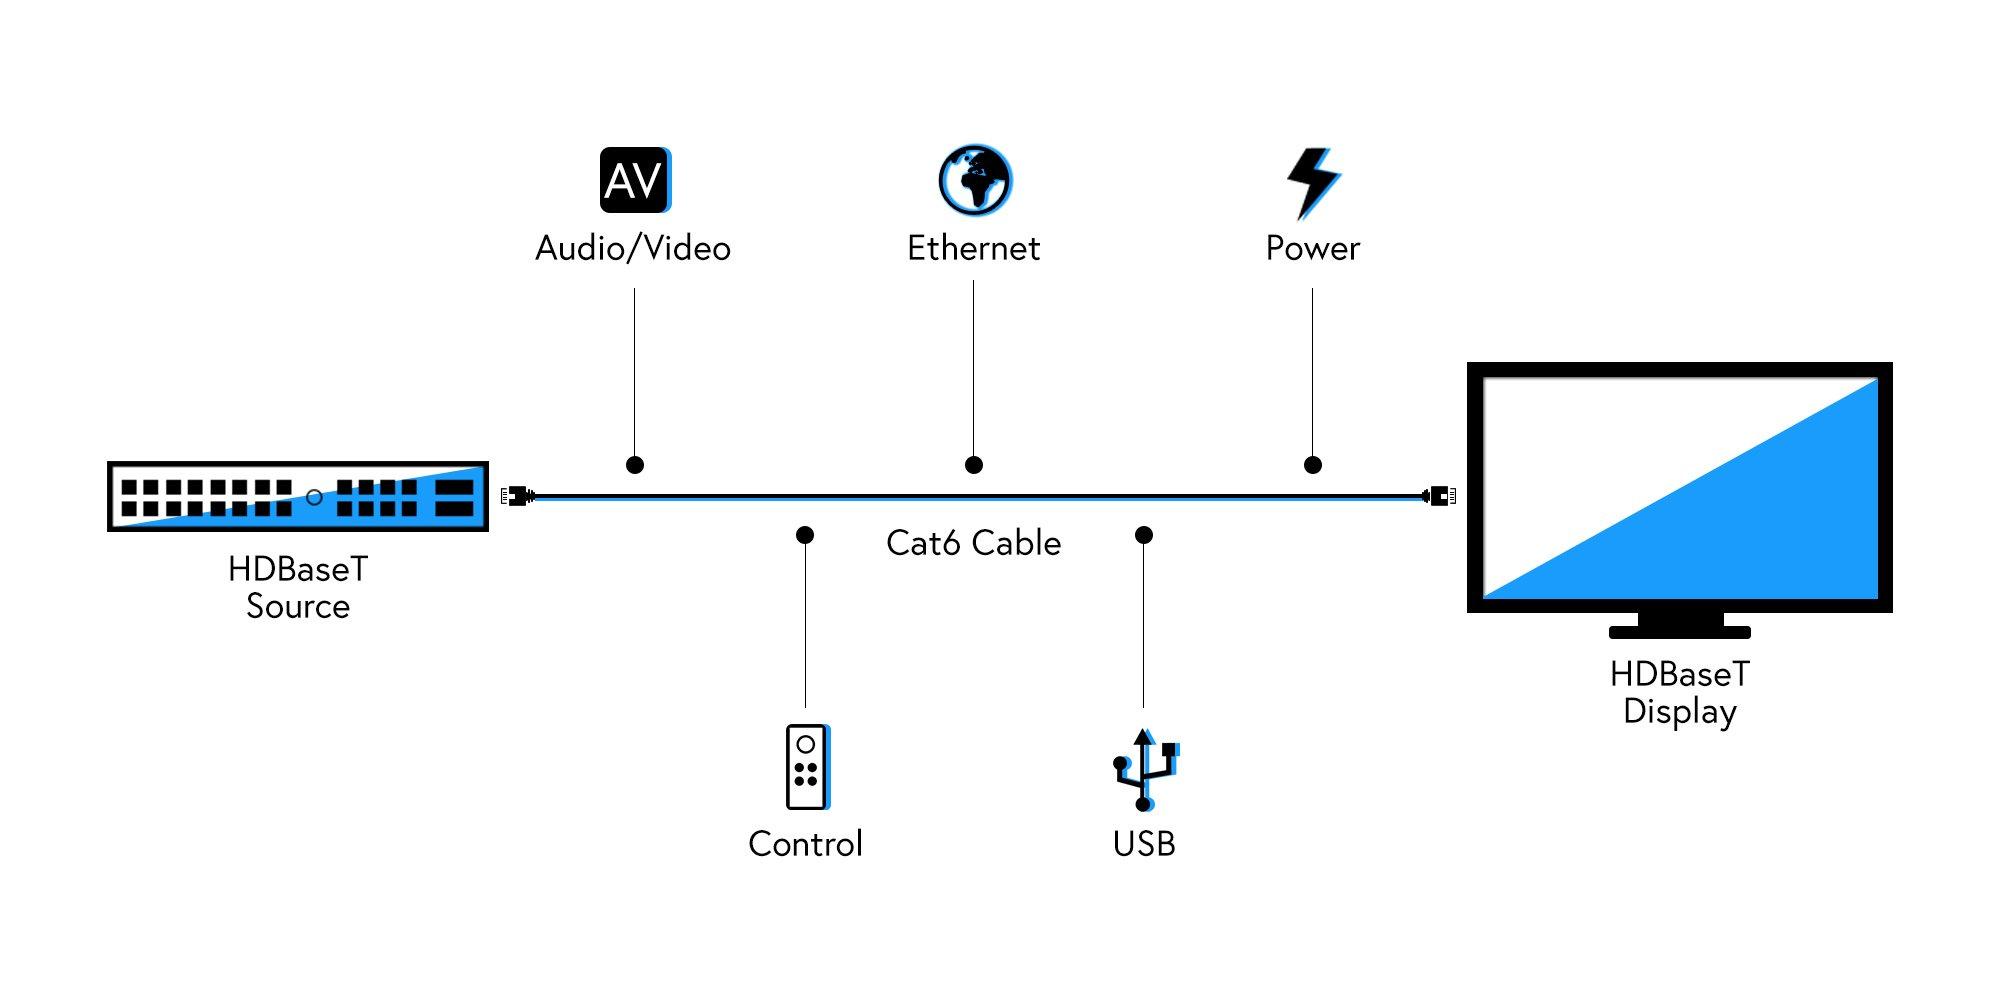 HDBaseT diagram